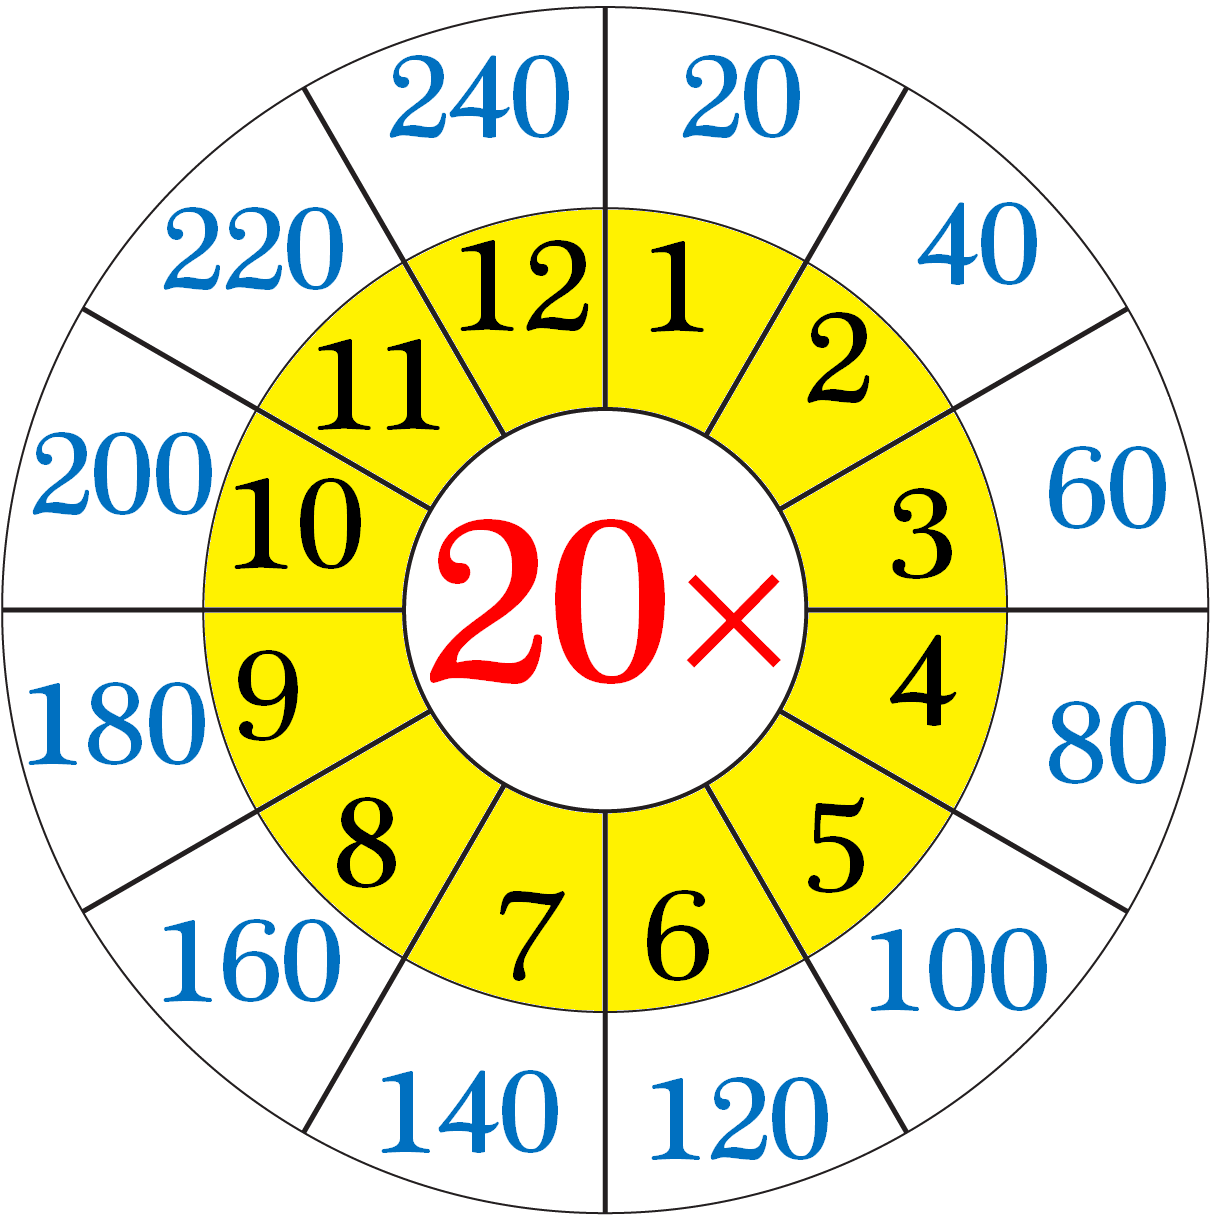 Multiplication Table of Twenty